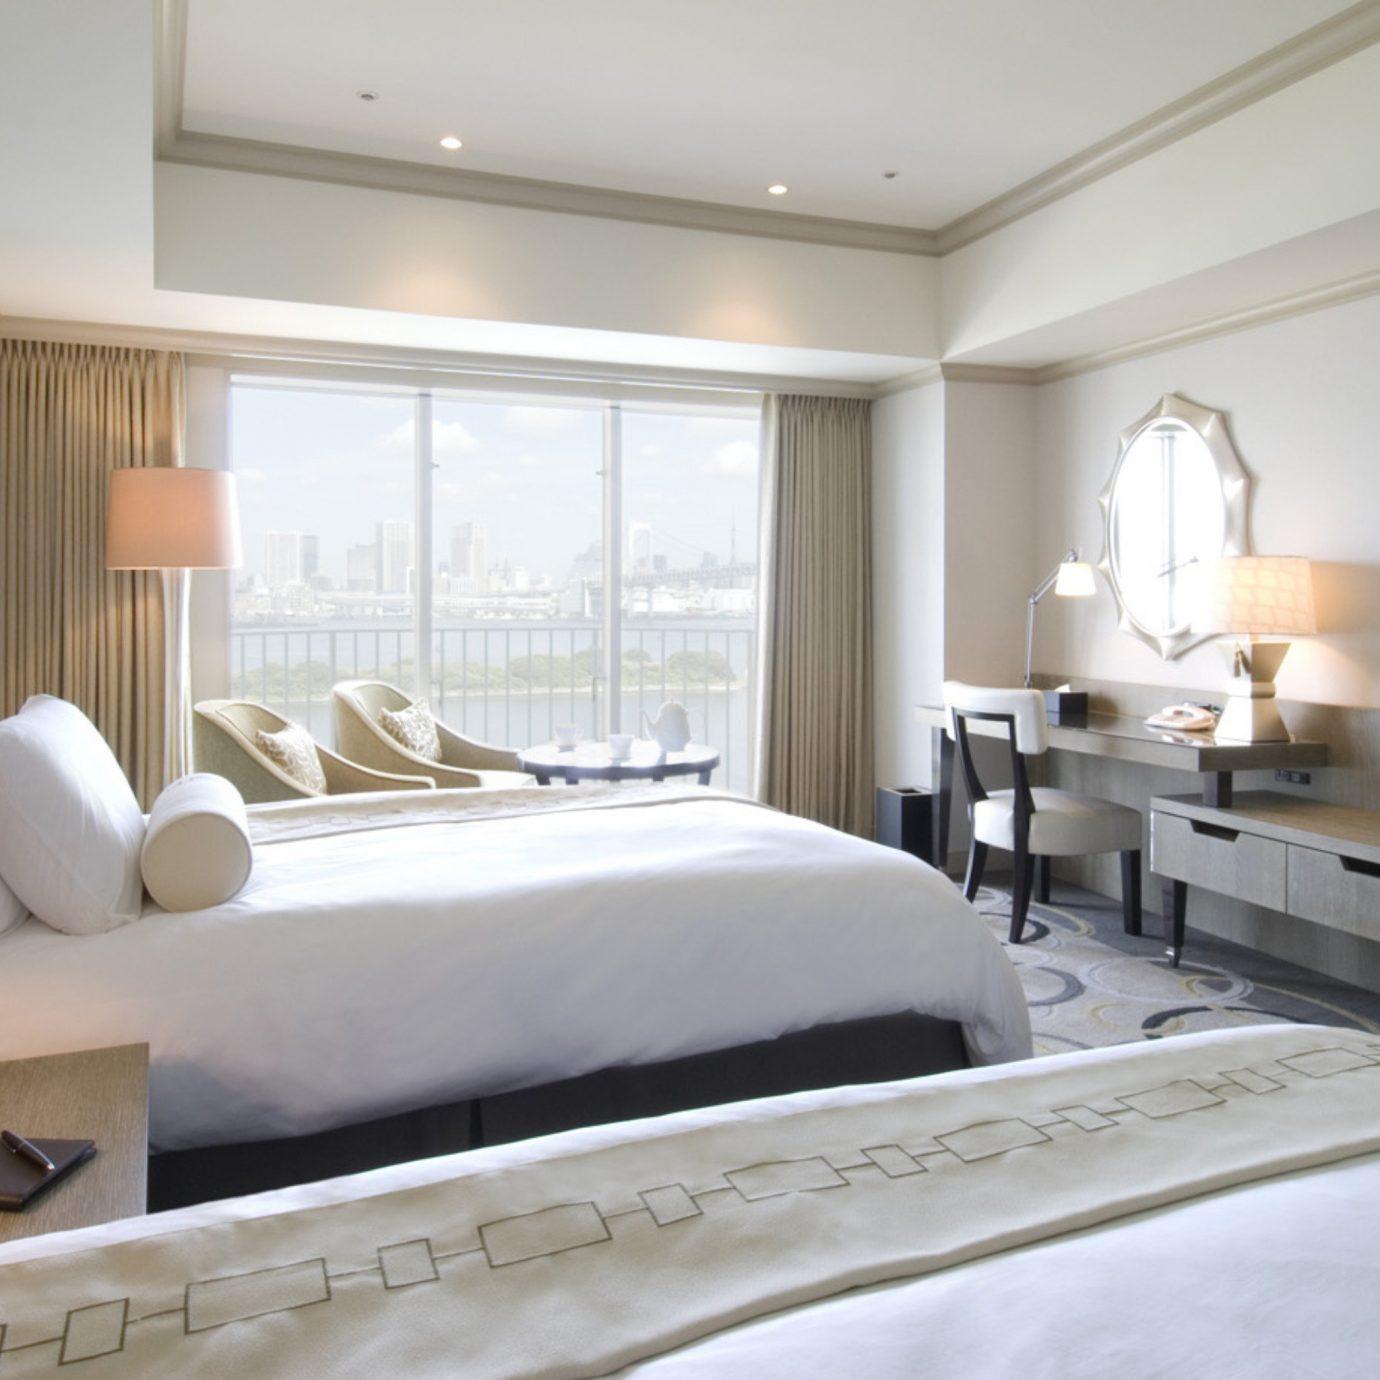 Bedroom Classic Resort property living room home white Suite condominium cottage flat